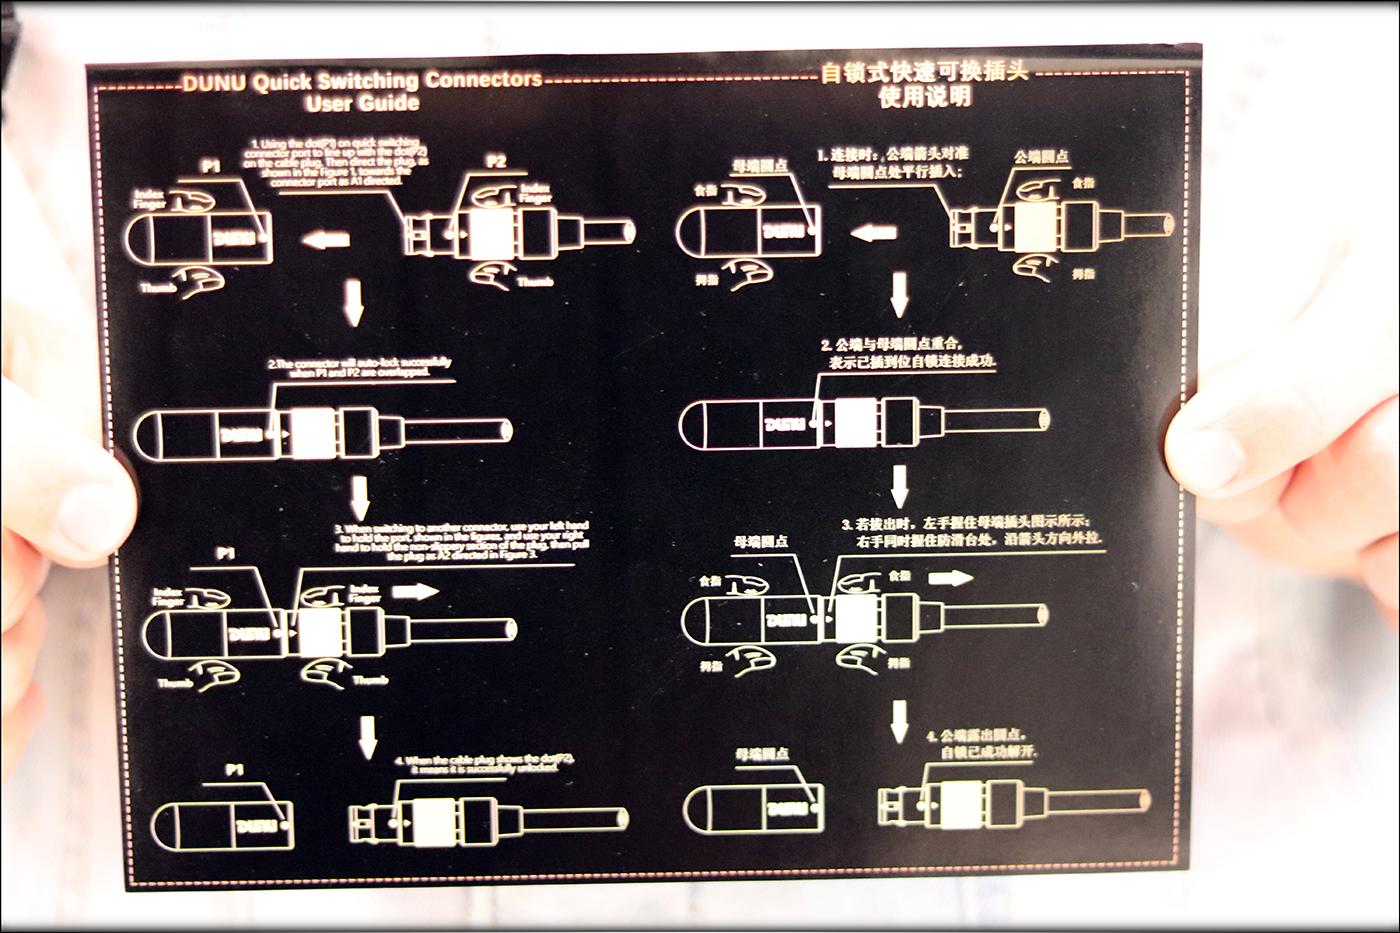 Dunu-Hulk-Modular-4.4-3.5-2.5-Balanced-2Pin-Cable-MMCX-IEMs-Earphones-Headphones-In-Depth-Revi...jpg